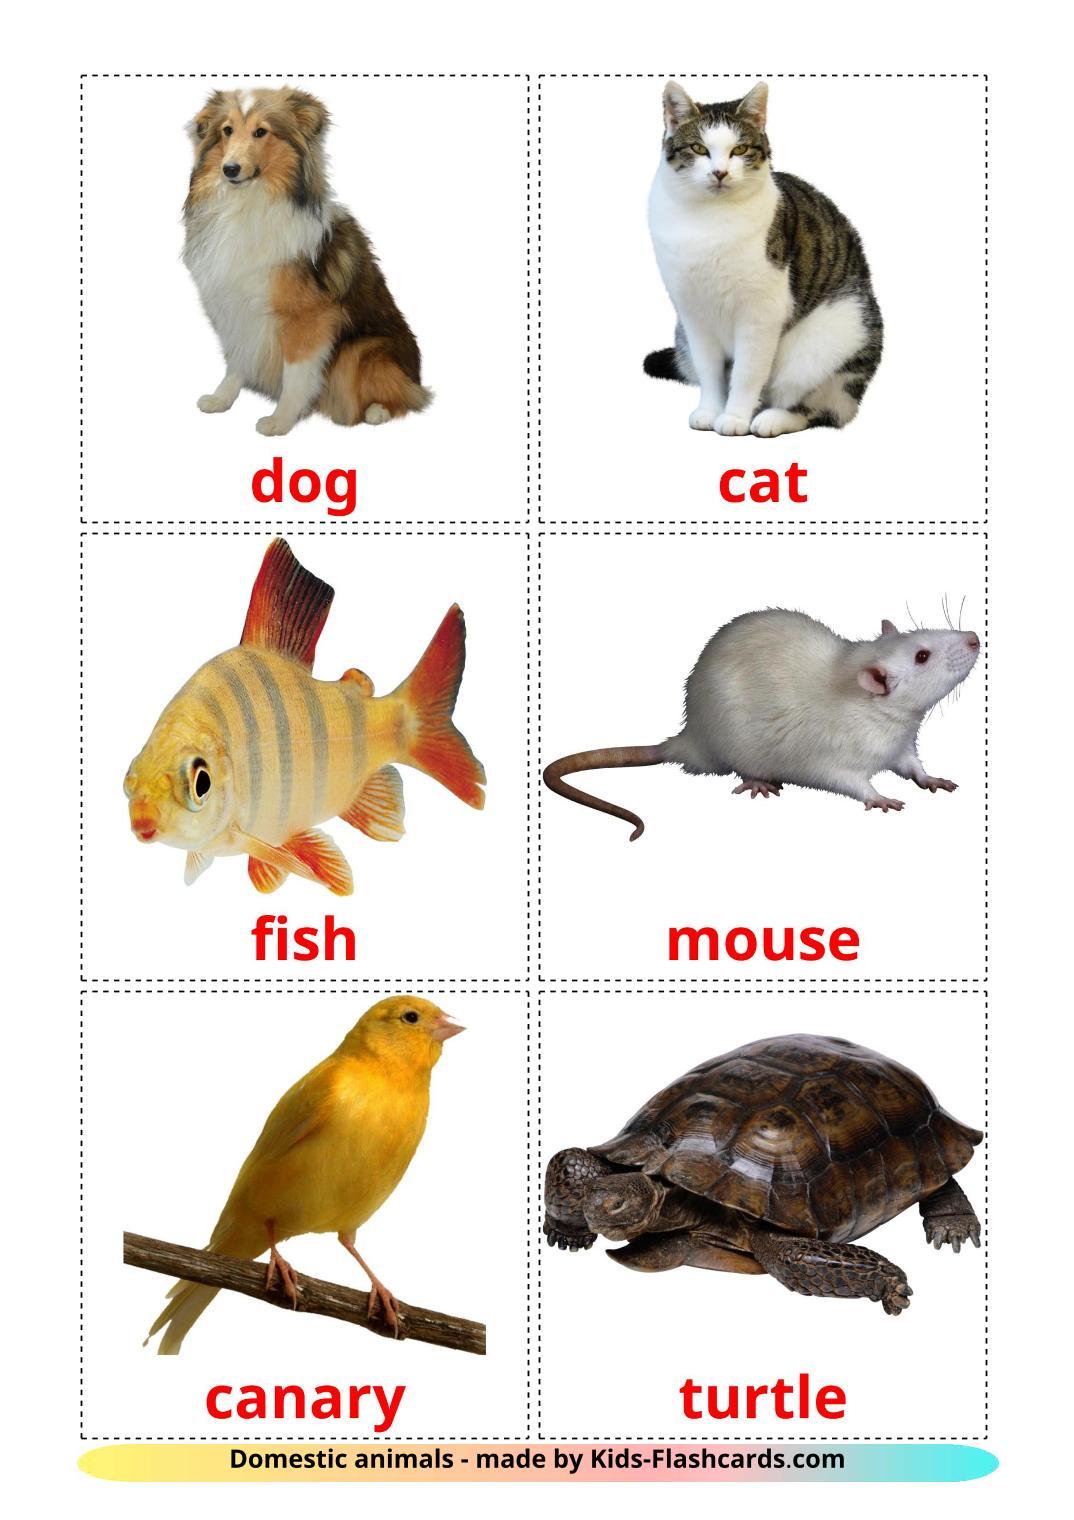 Domestic animals - 10 Free Printable english Flashcards